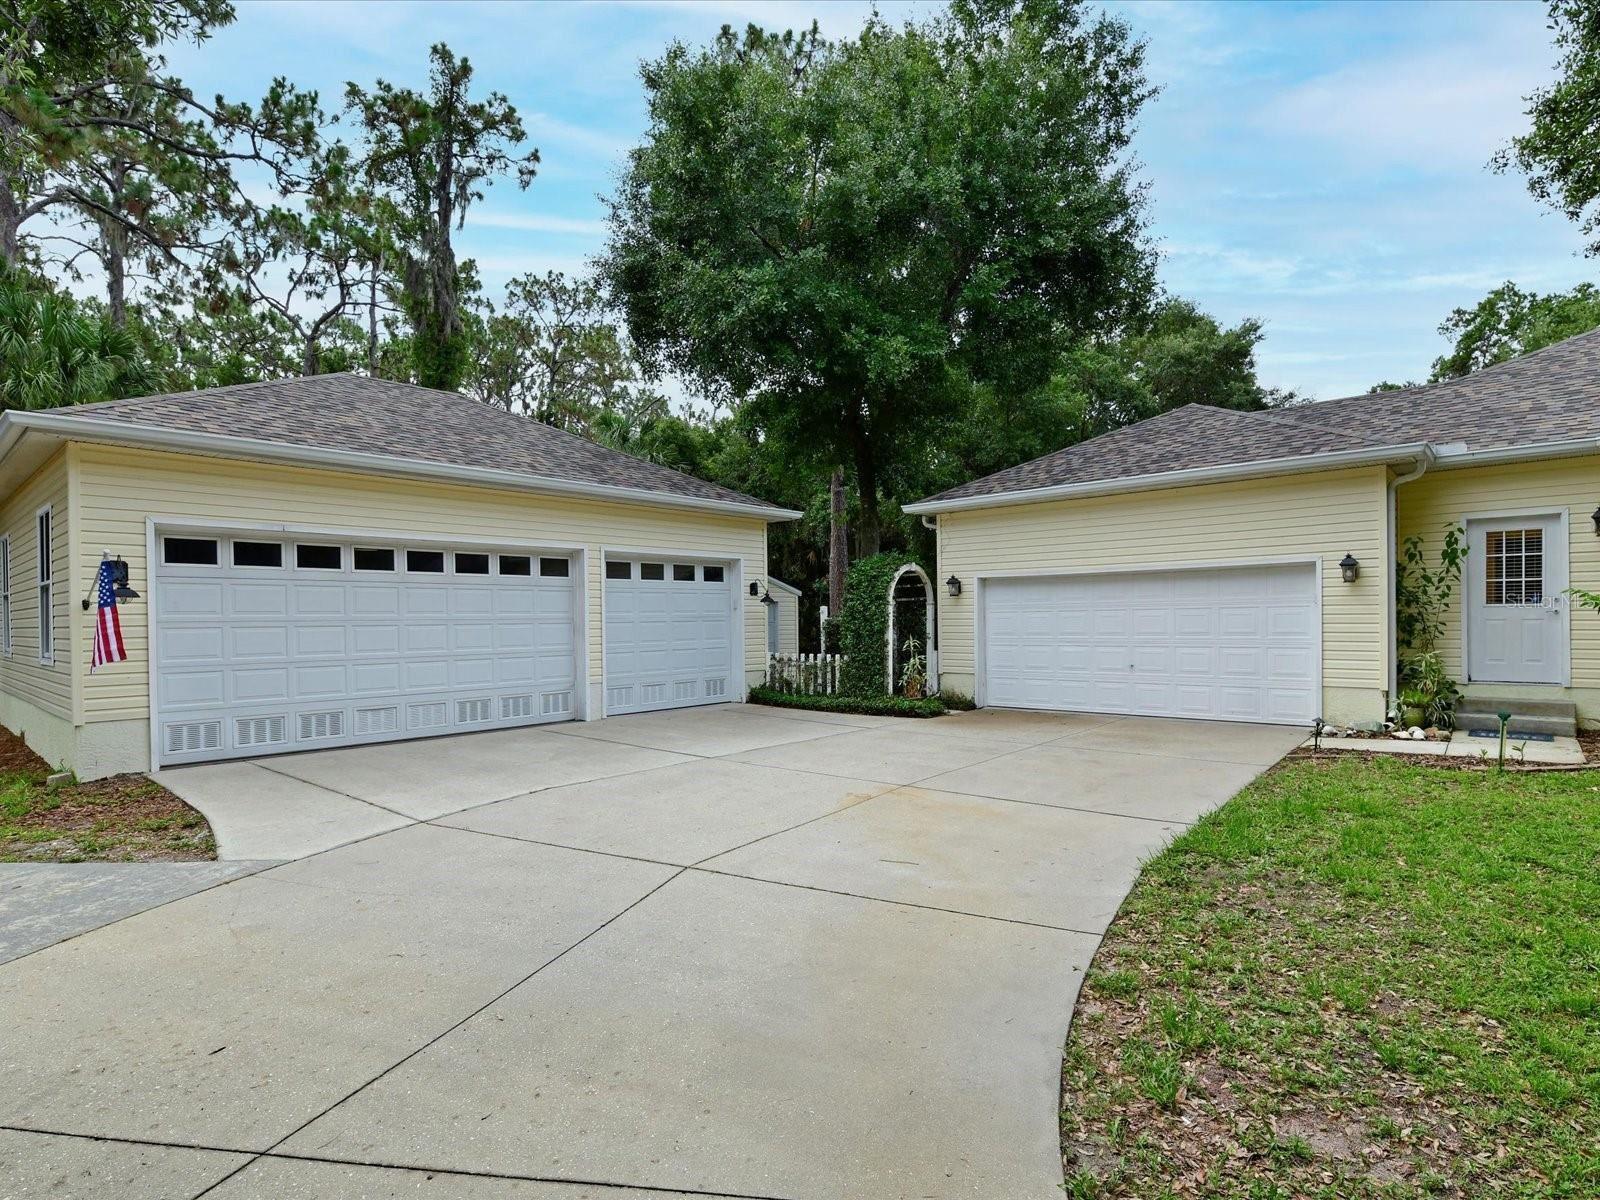 Photo of 817 137TH STREET NE, BRADENTON, FL 34212 (MLS # A4504192)